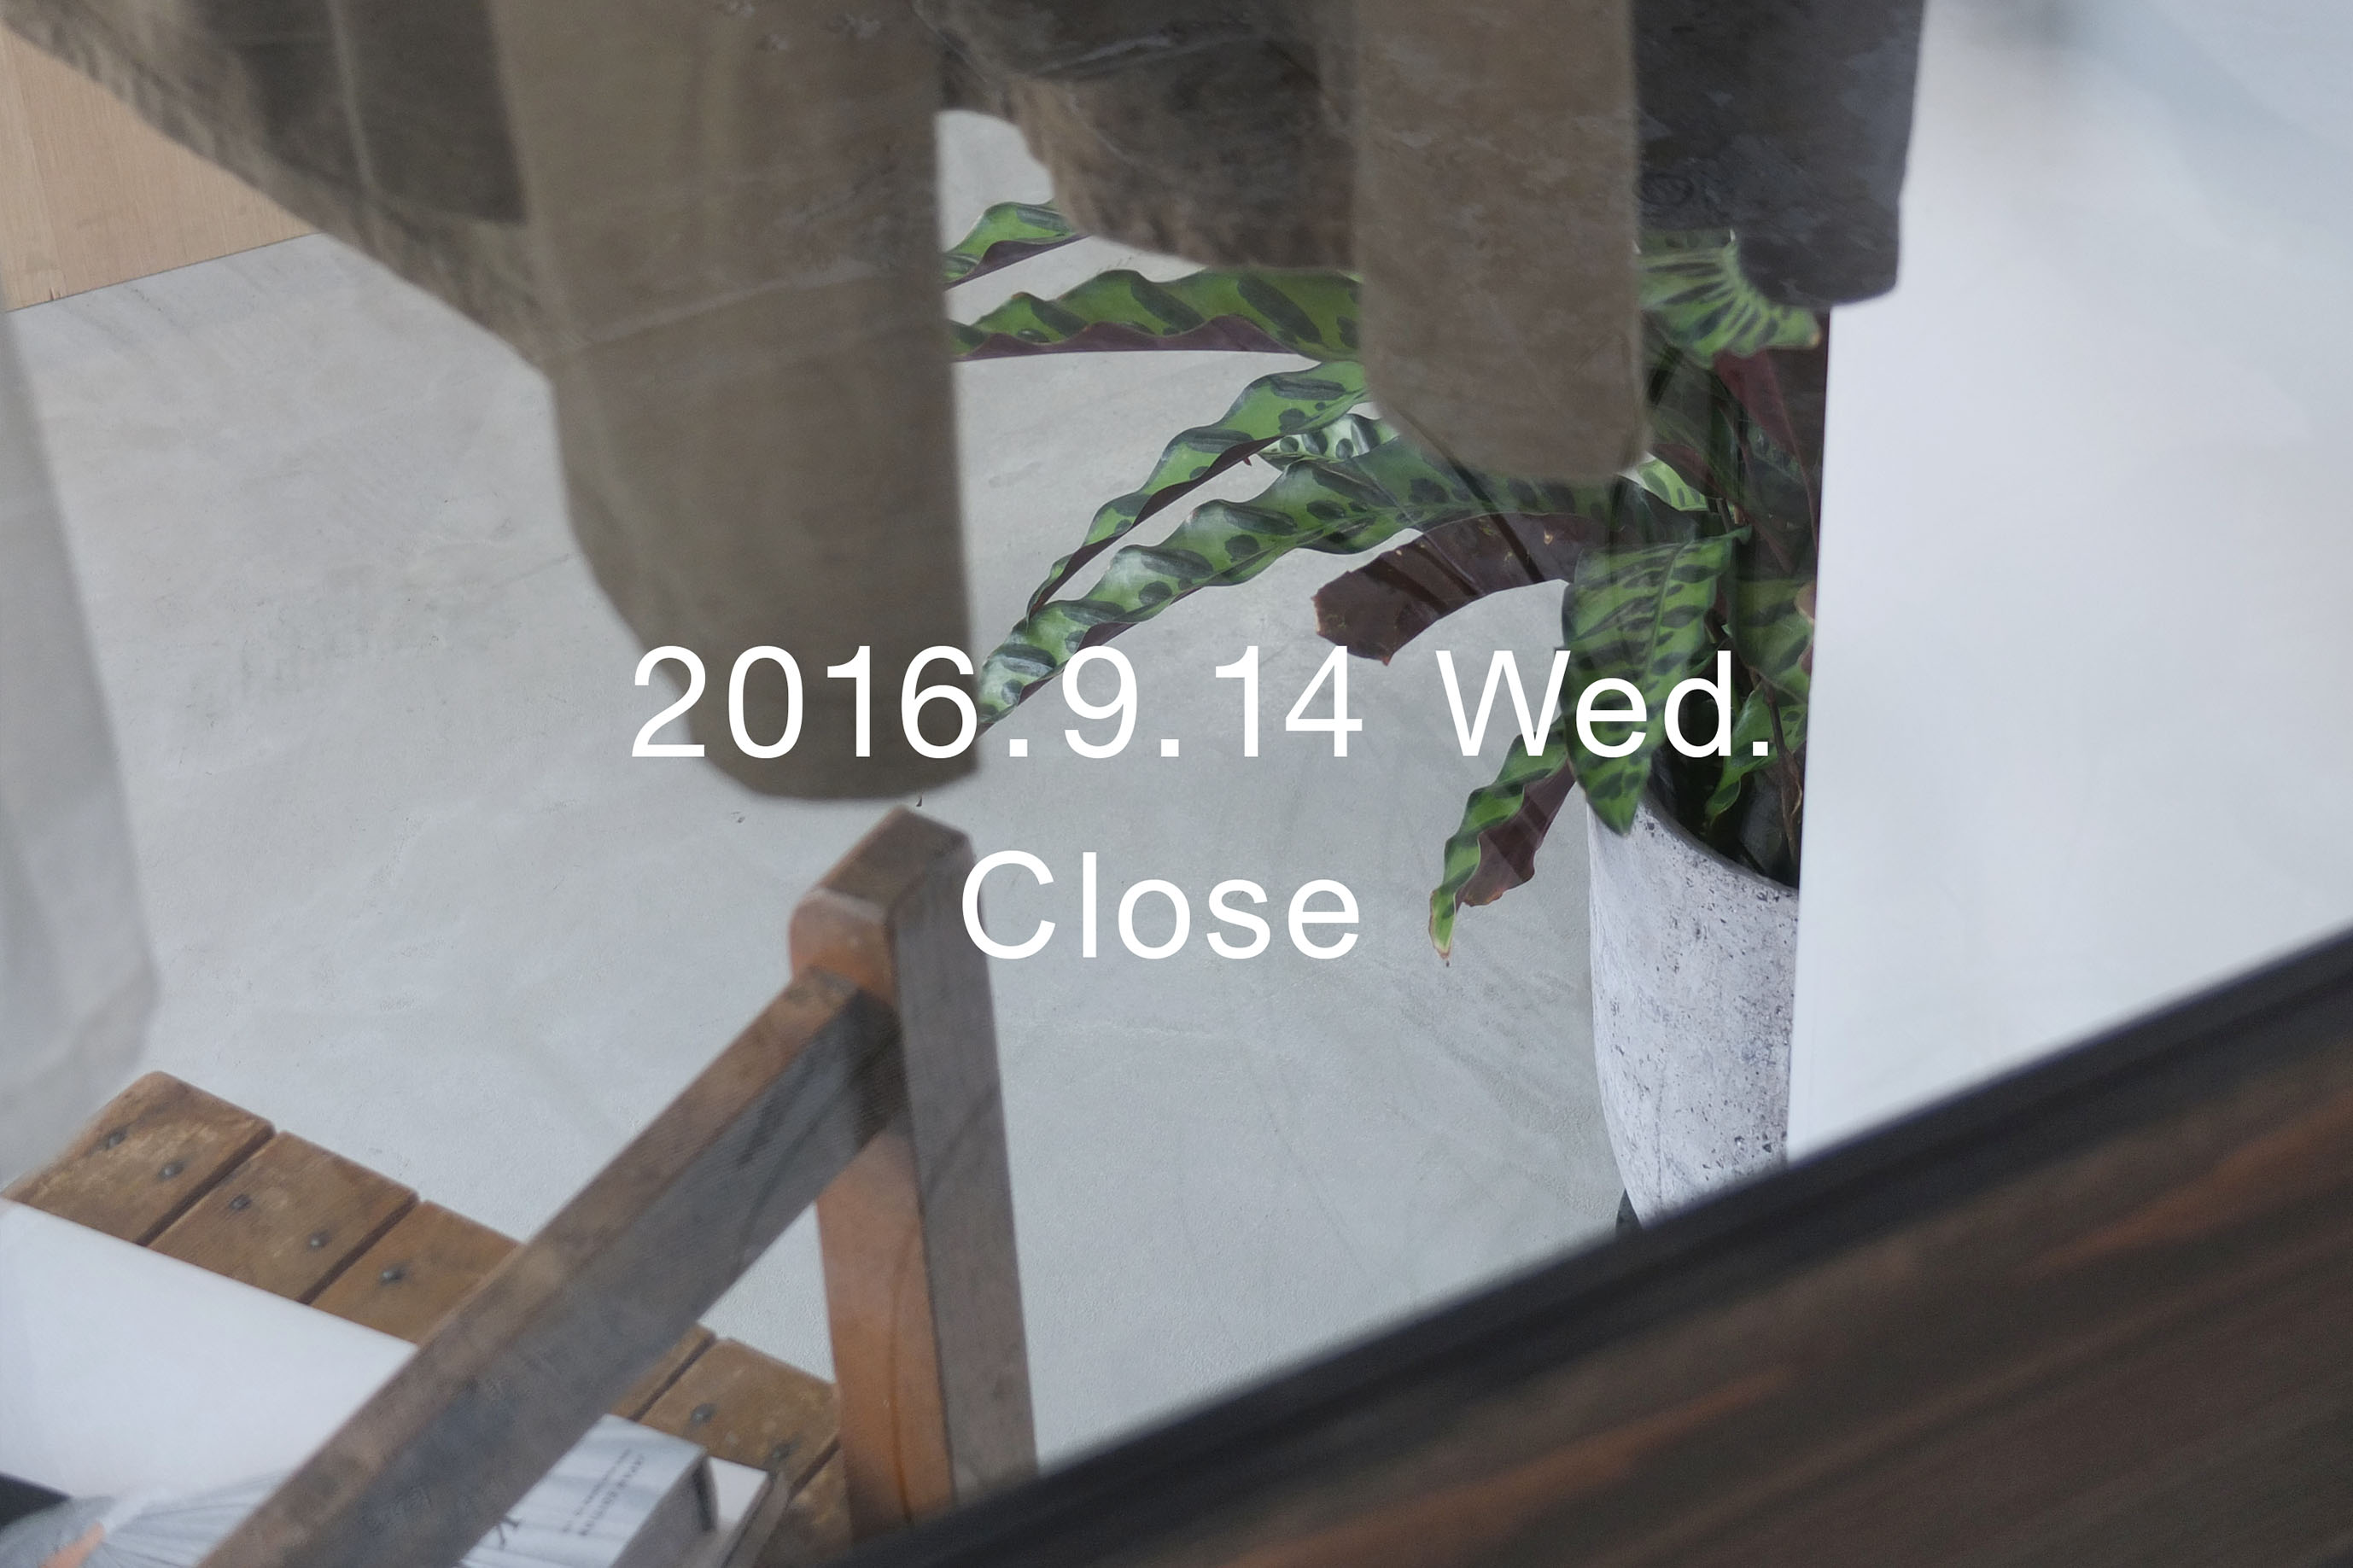 ss-open_20160914